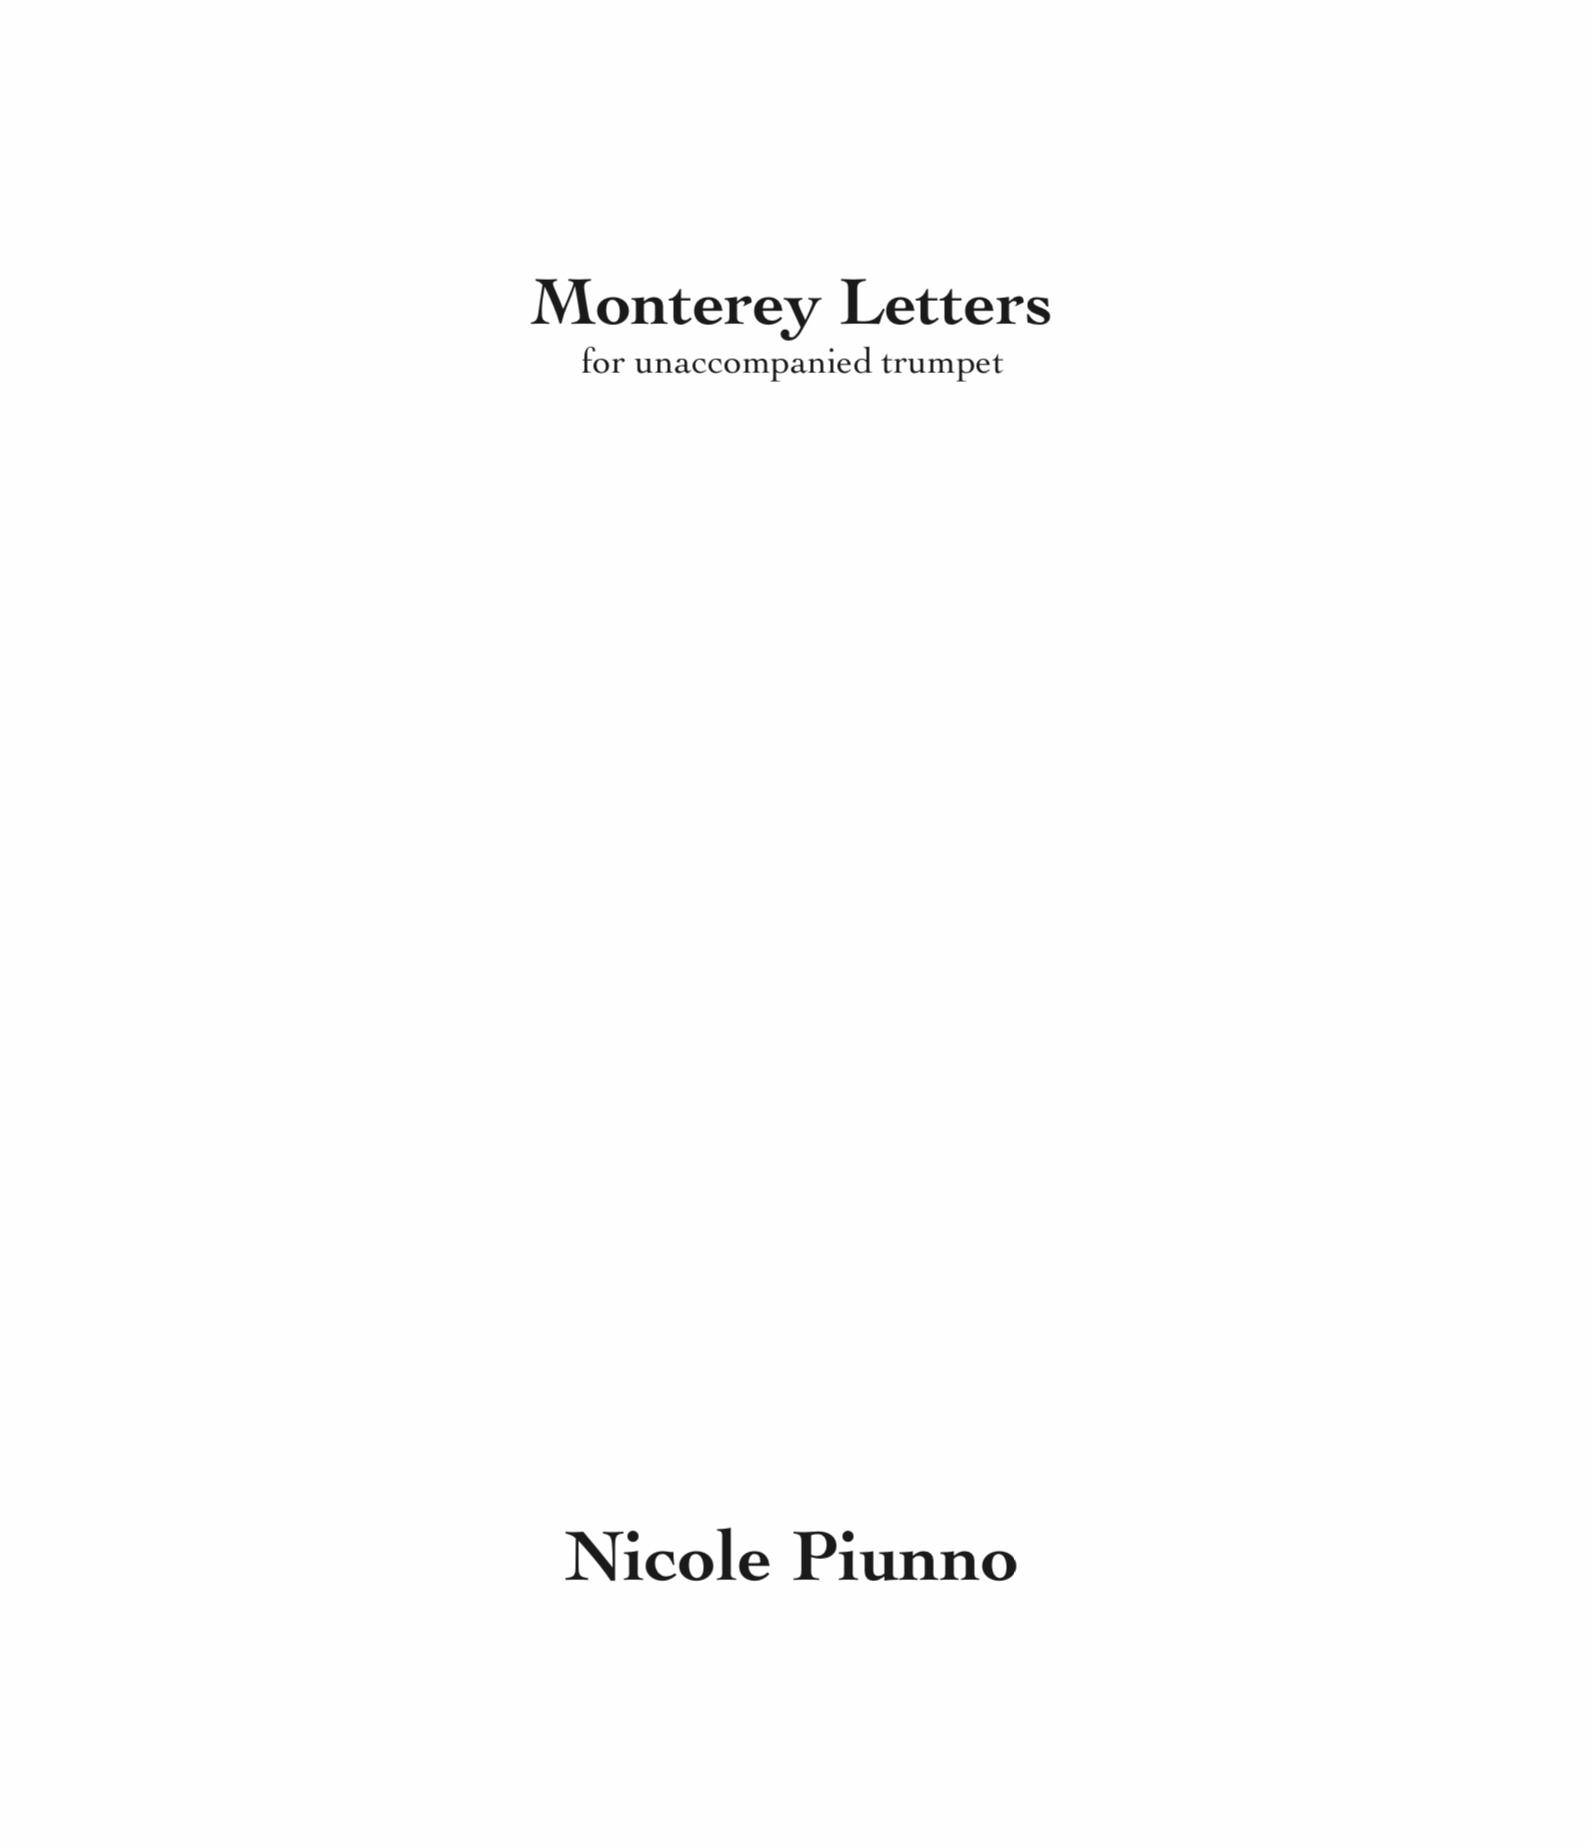 Monterey Letters by Nicole Piunno